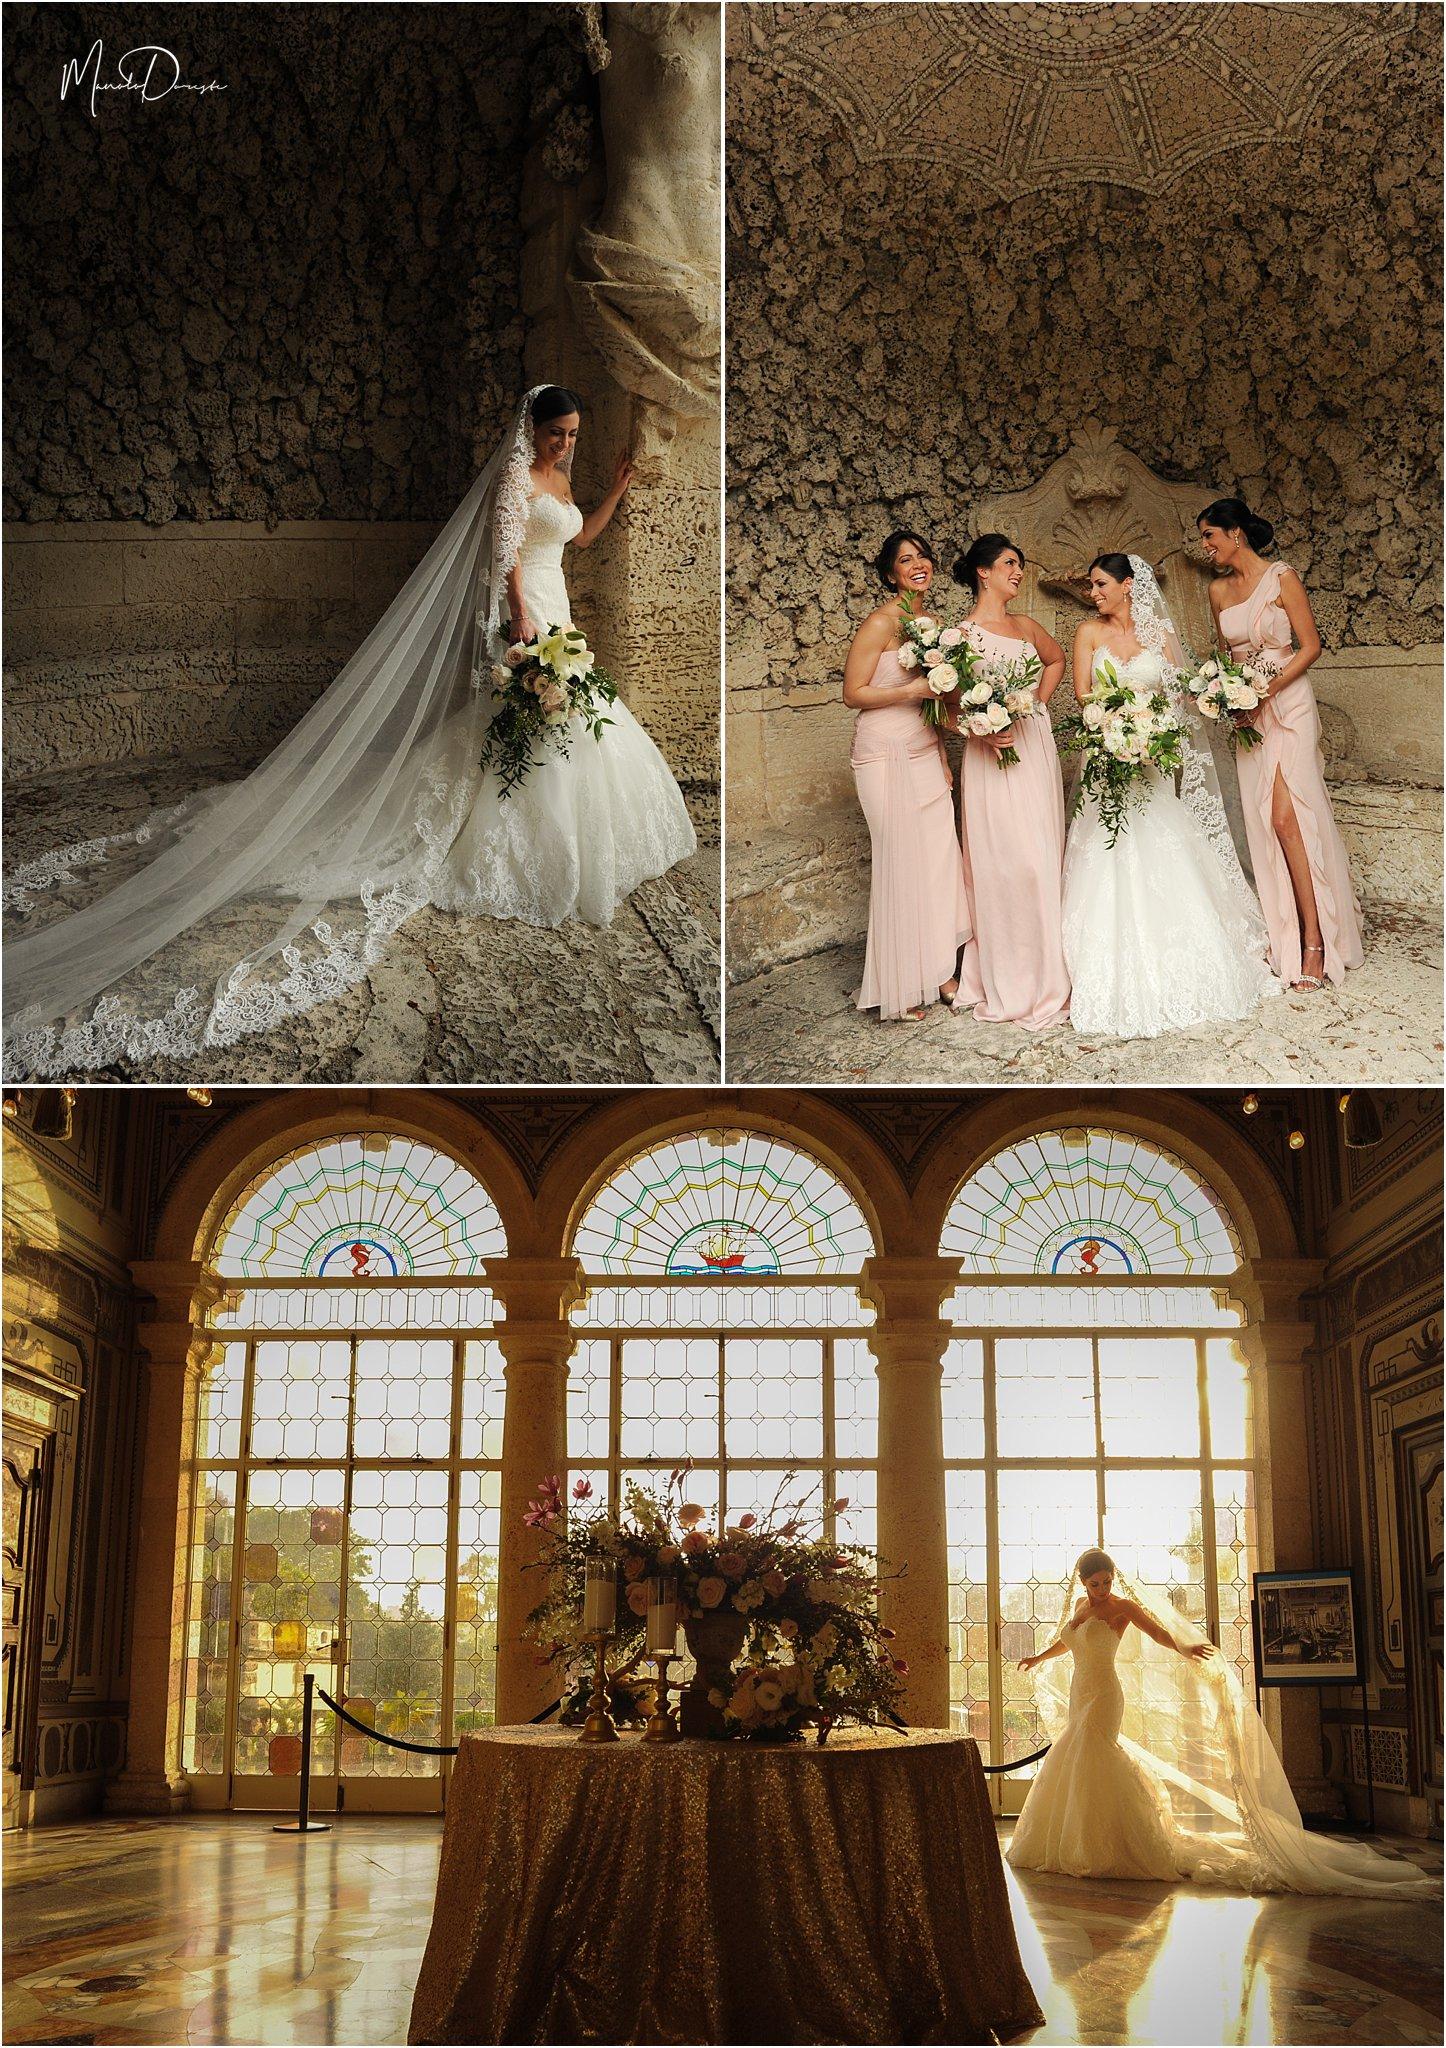 00753_ManoloDoreste_InFocusStudios_Wedding_Family_Photography_Miami_MiamiPhotographer.jpg